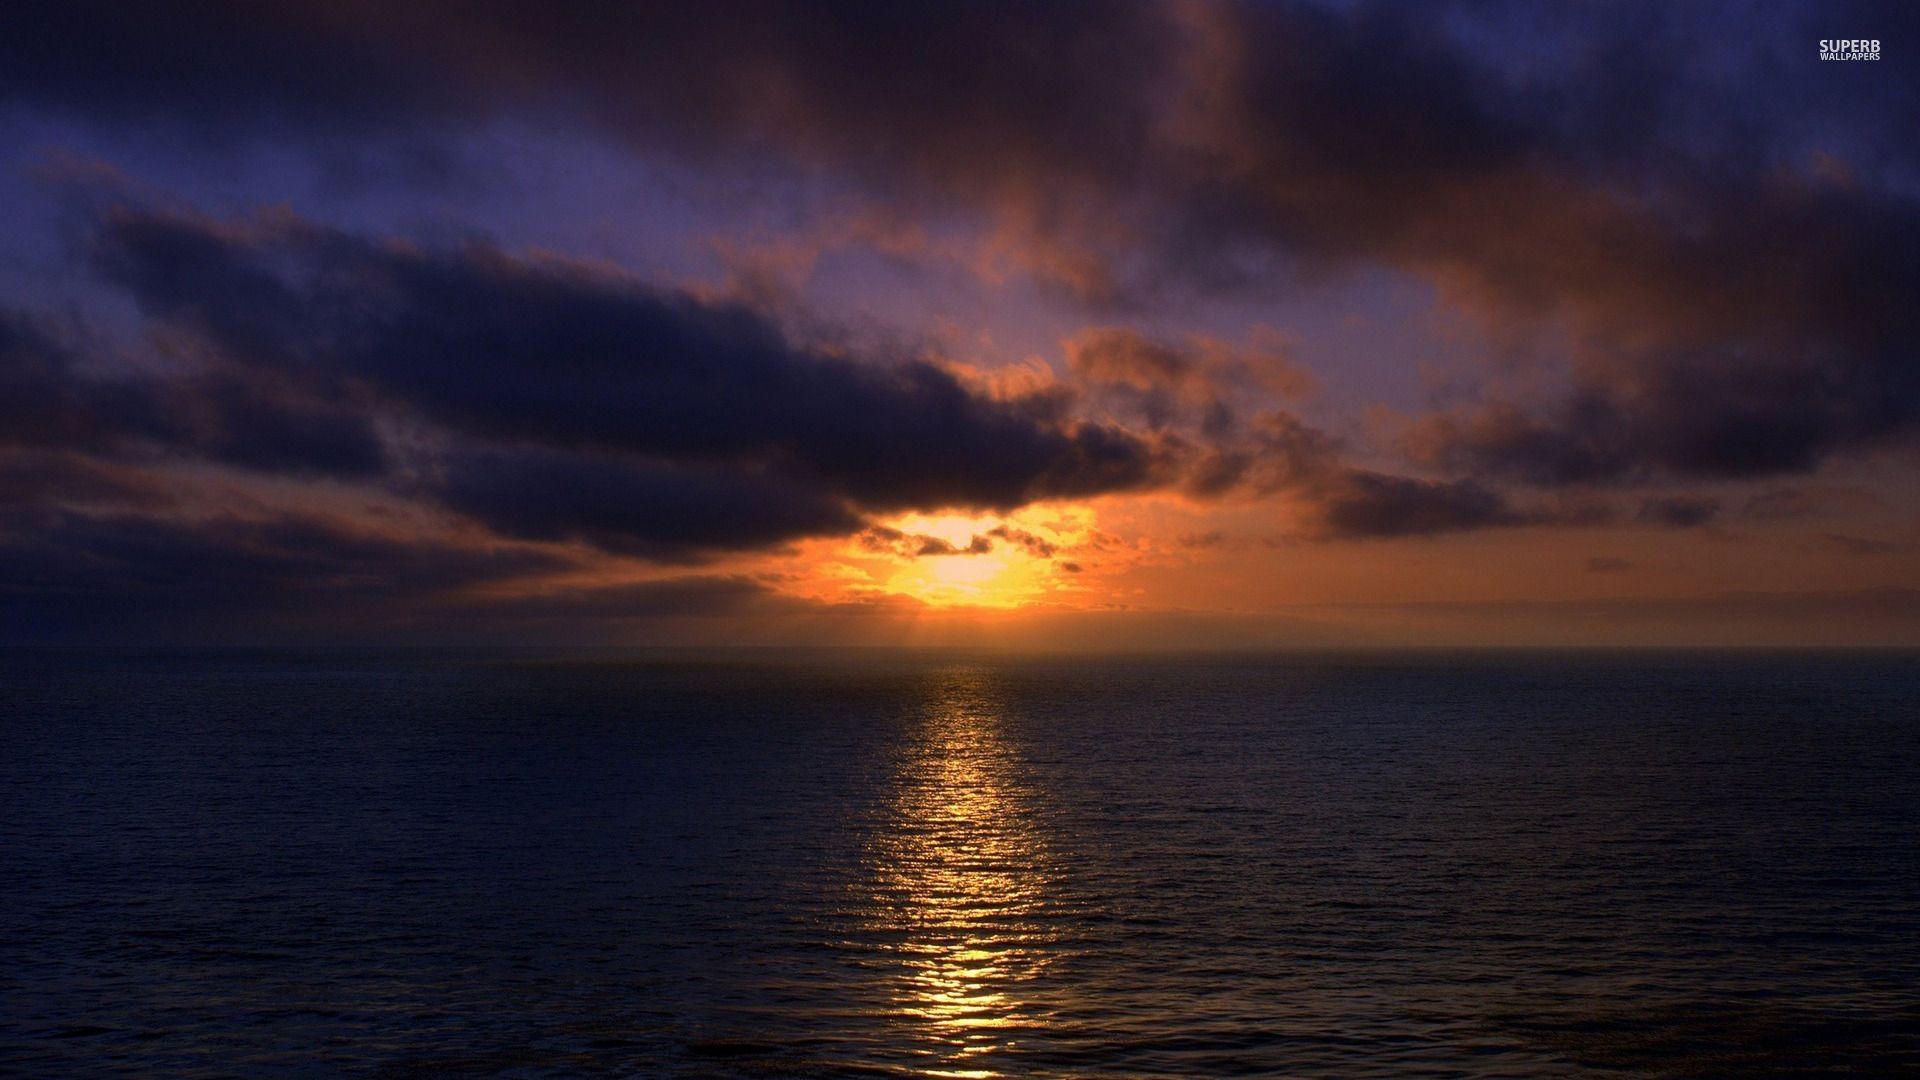 Ocean Sunset wallpaper image hd